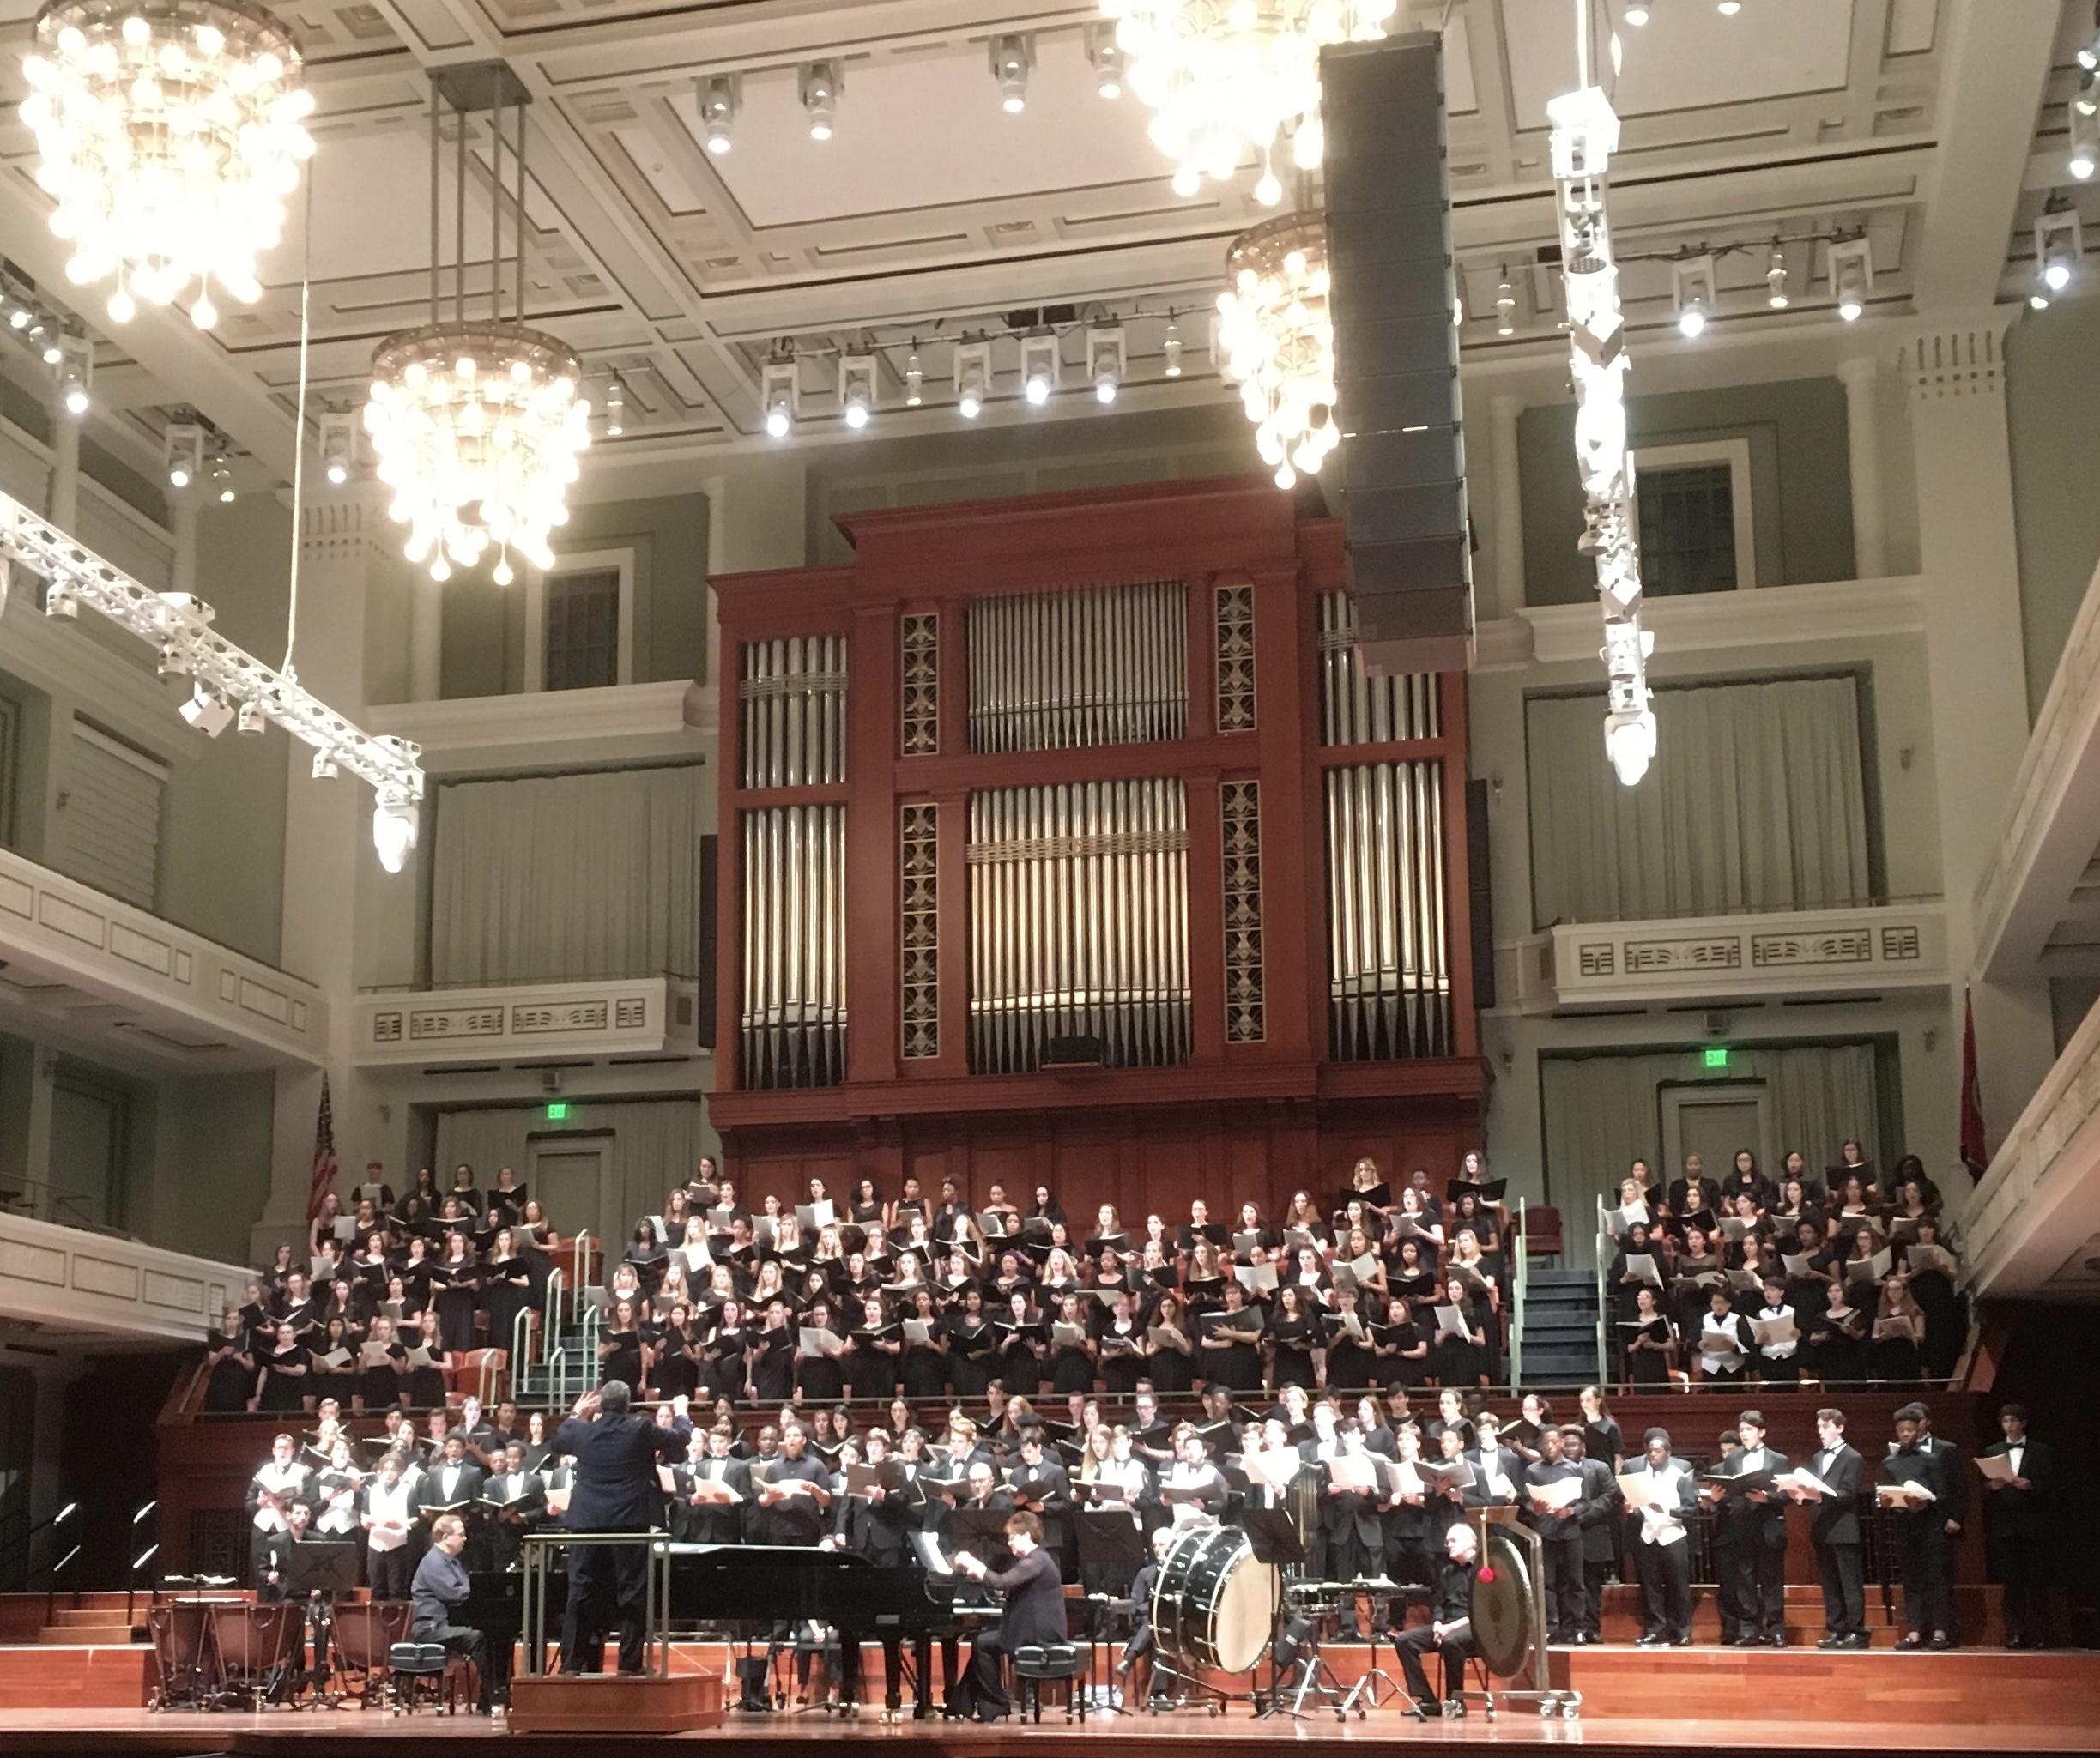 The 2019 Schermerhorn Invitational Choral Festival | Walter